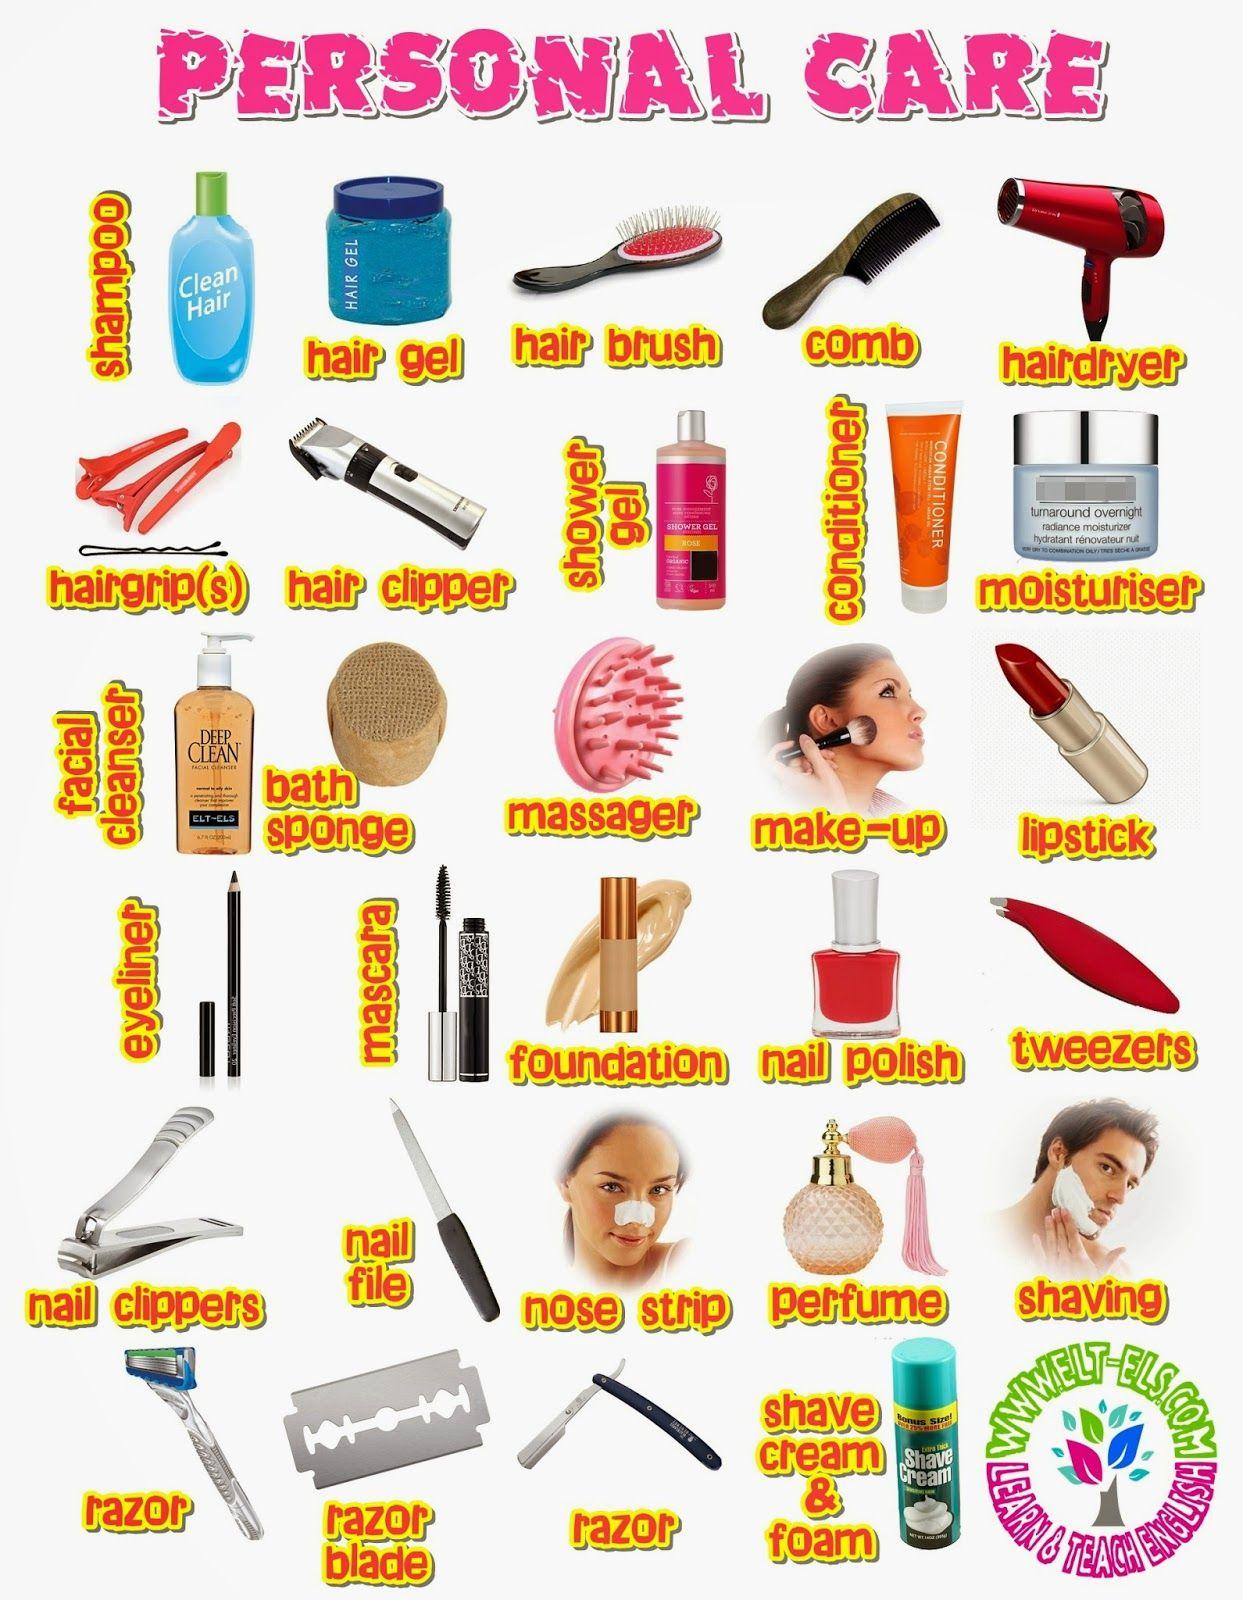 Personal Care Vocabulary